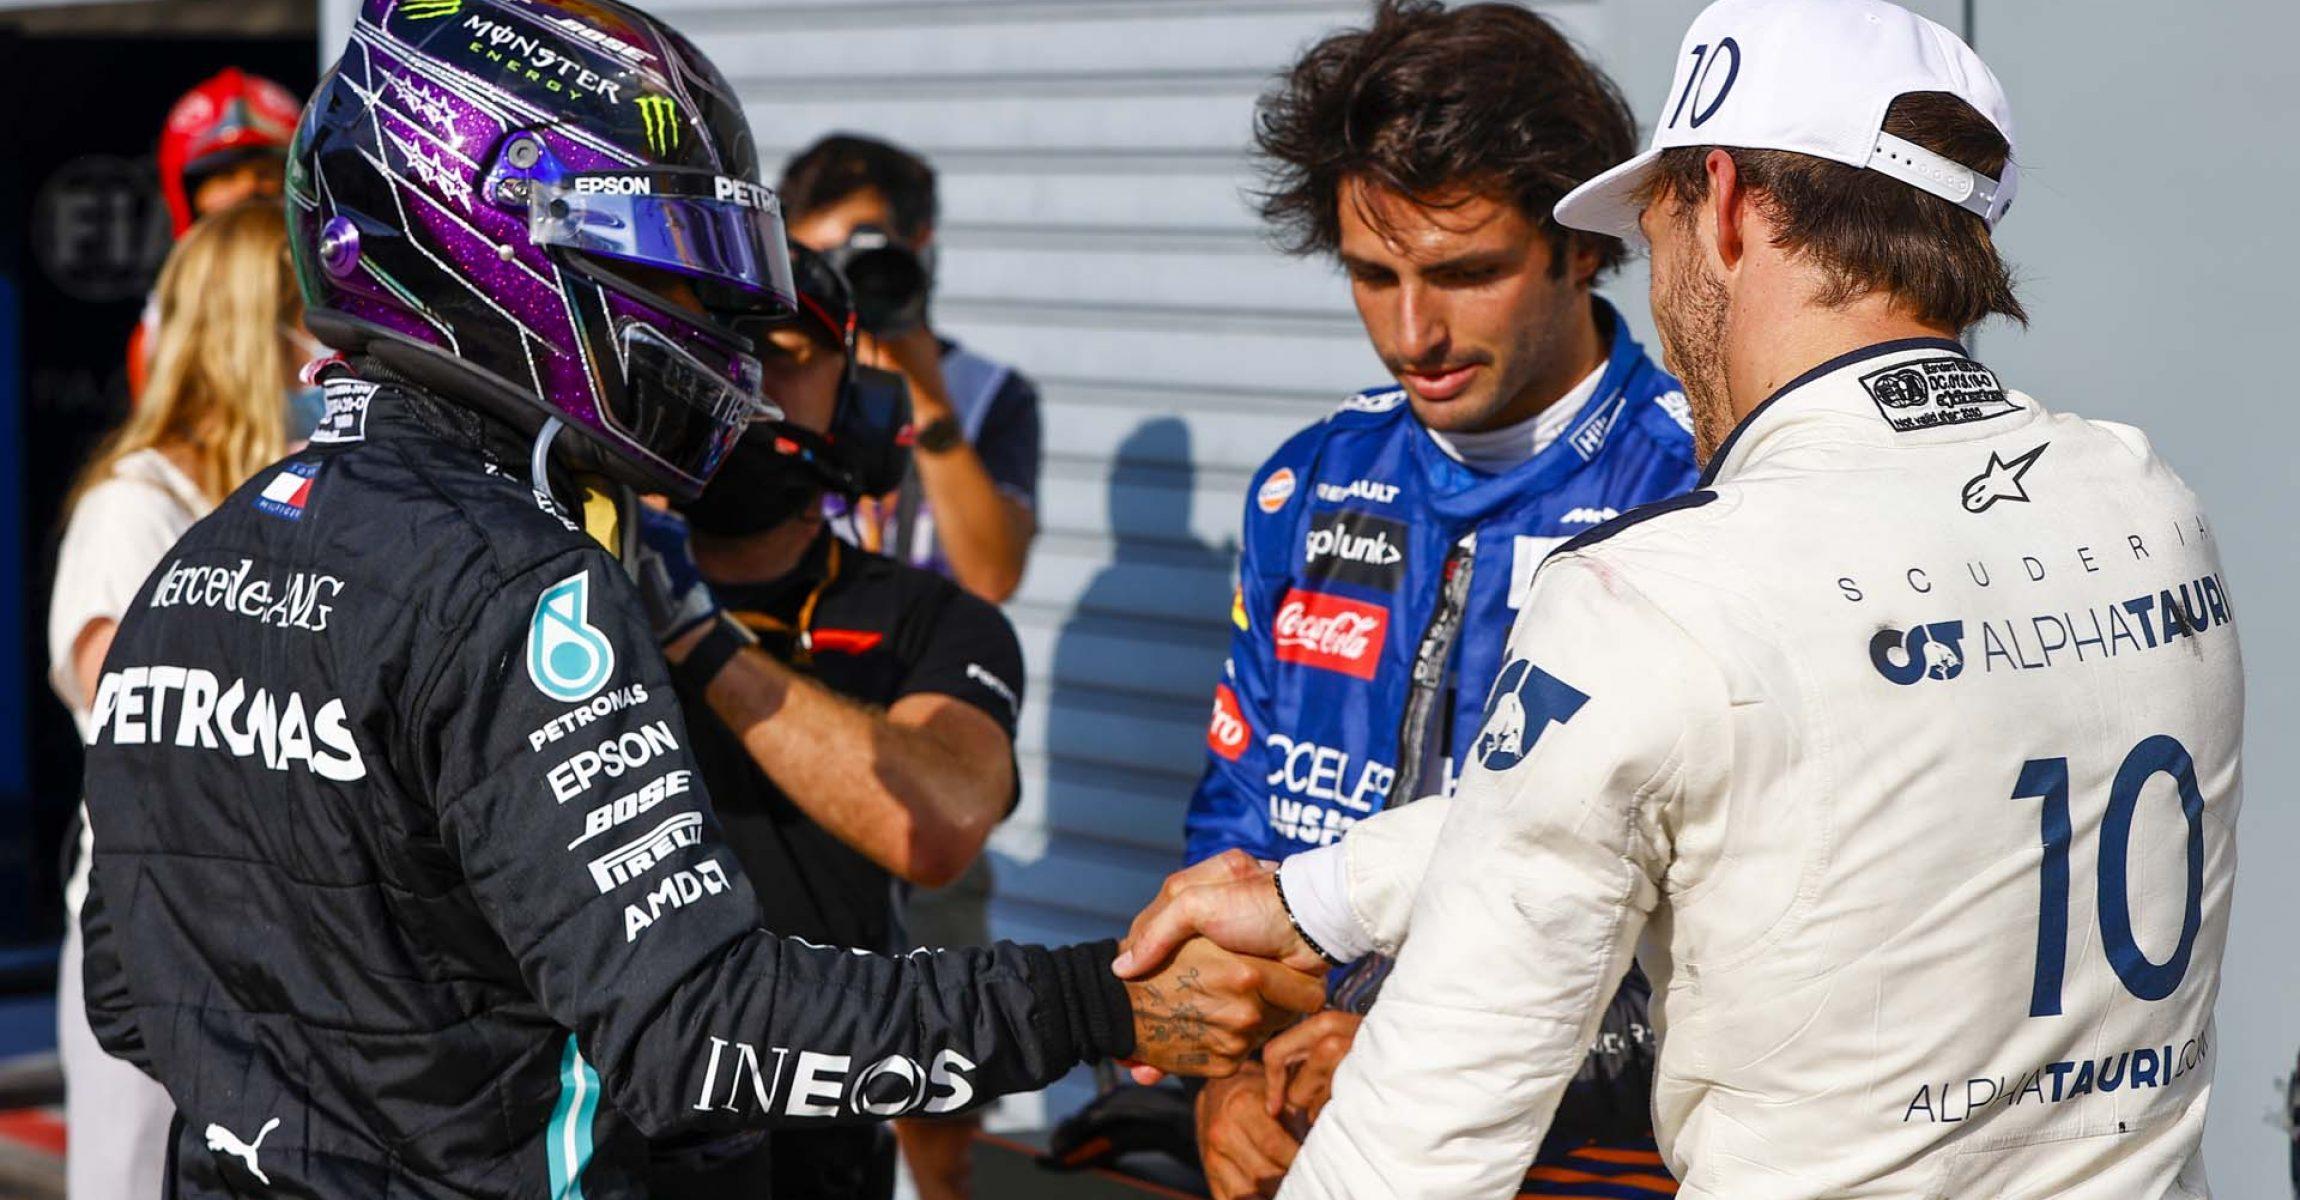 2020 Italian Grand Prix, Sunday - LAT Images Lewis Hamilton Carlos Sainz Pierre Gasly Mercedes